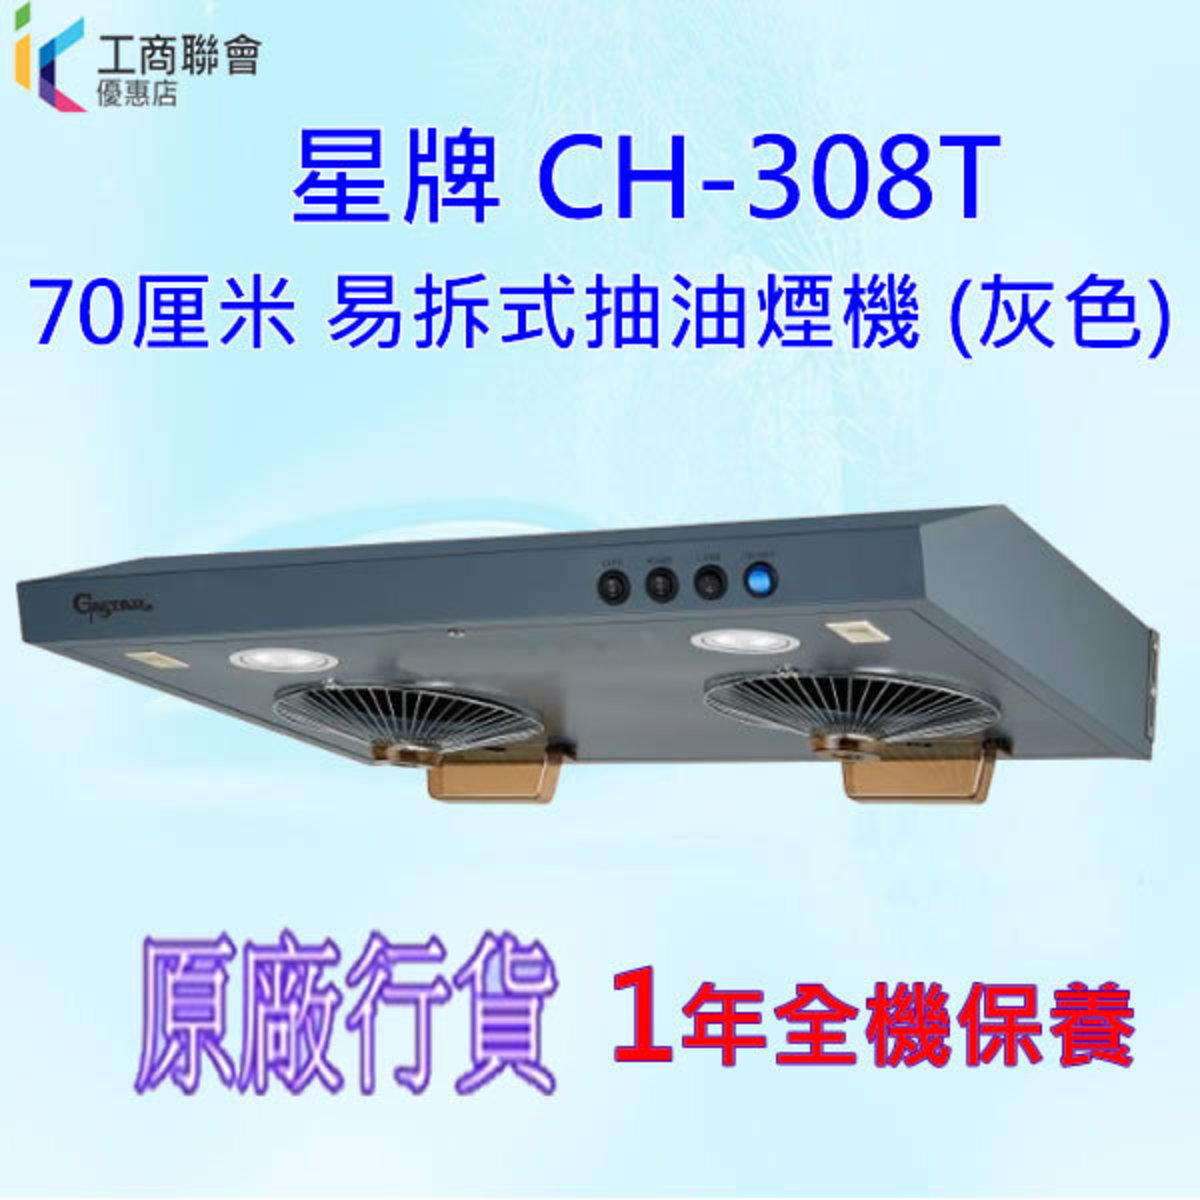 CH308T 70cm Easy Detachable Range Hood (Gray)